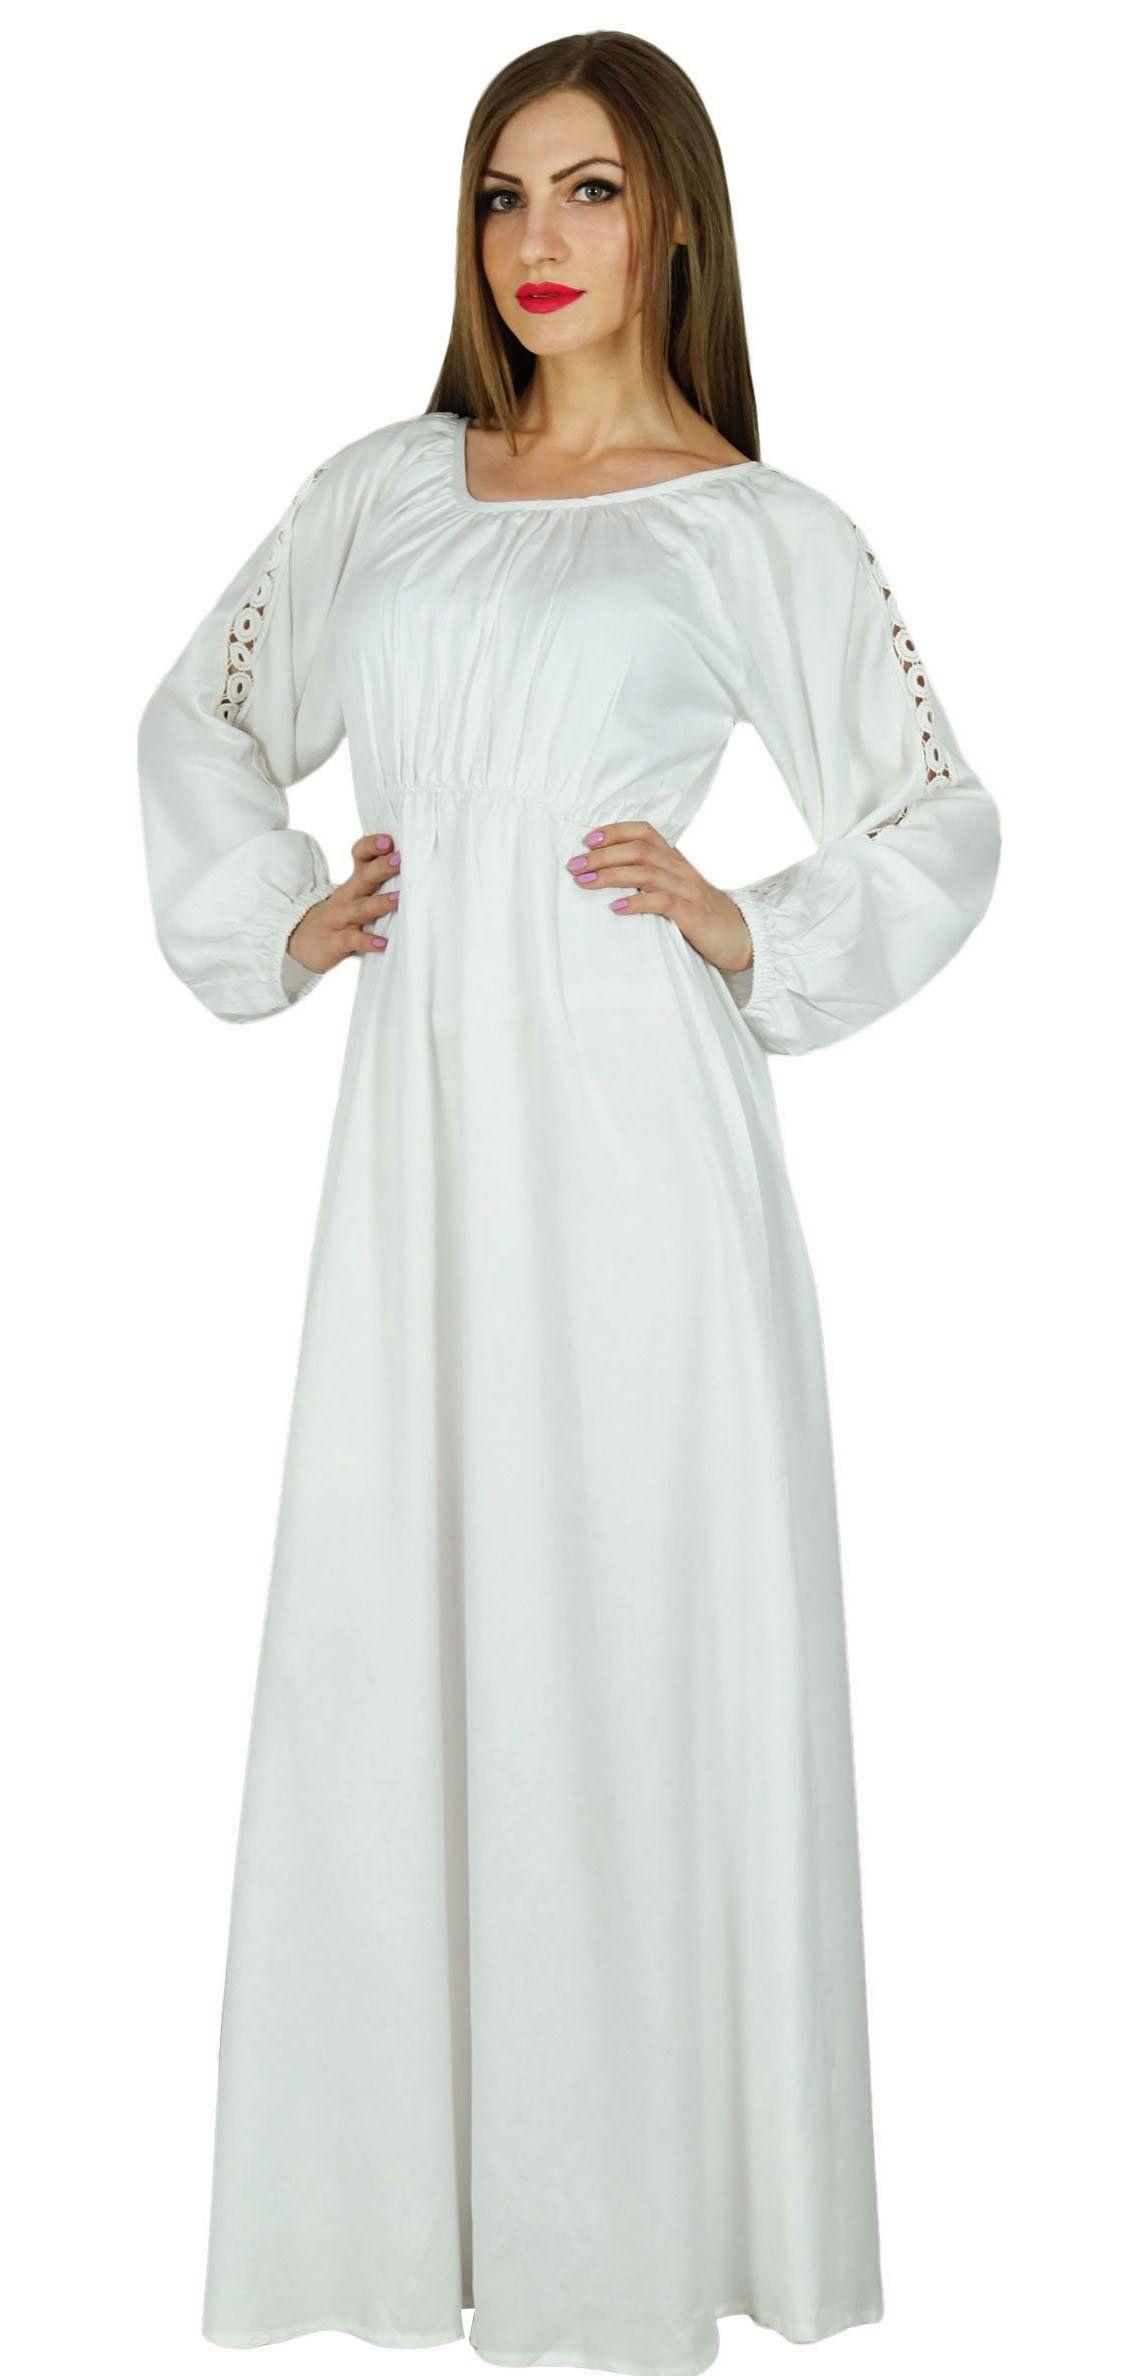 Bimba women boho gothic style long maxi dress lace long